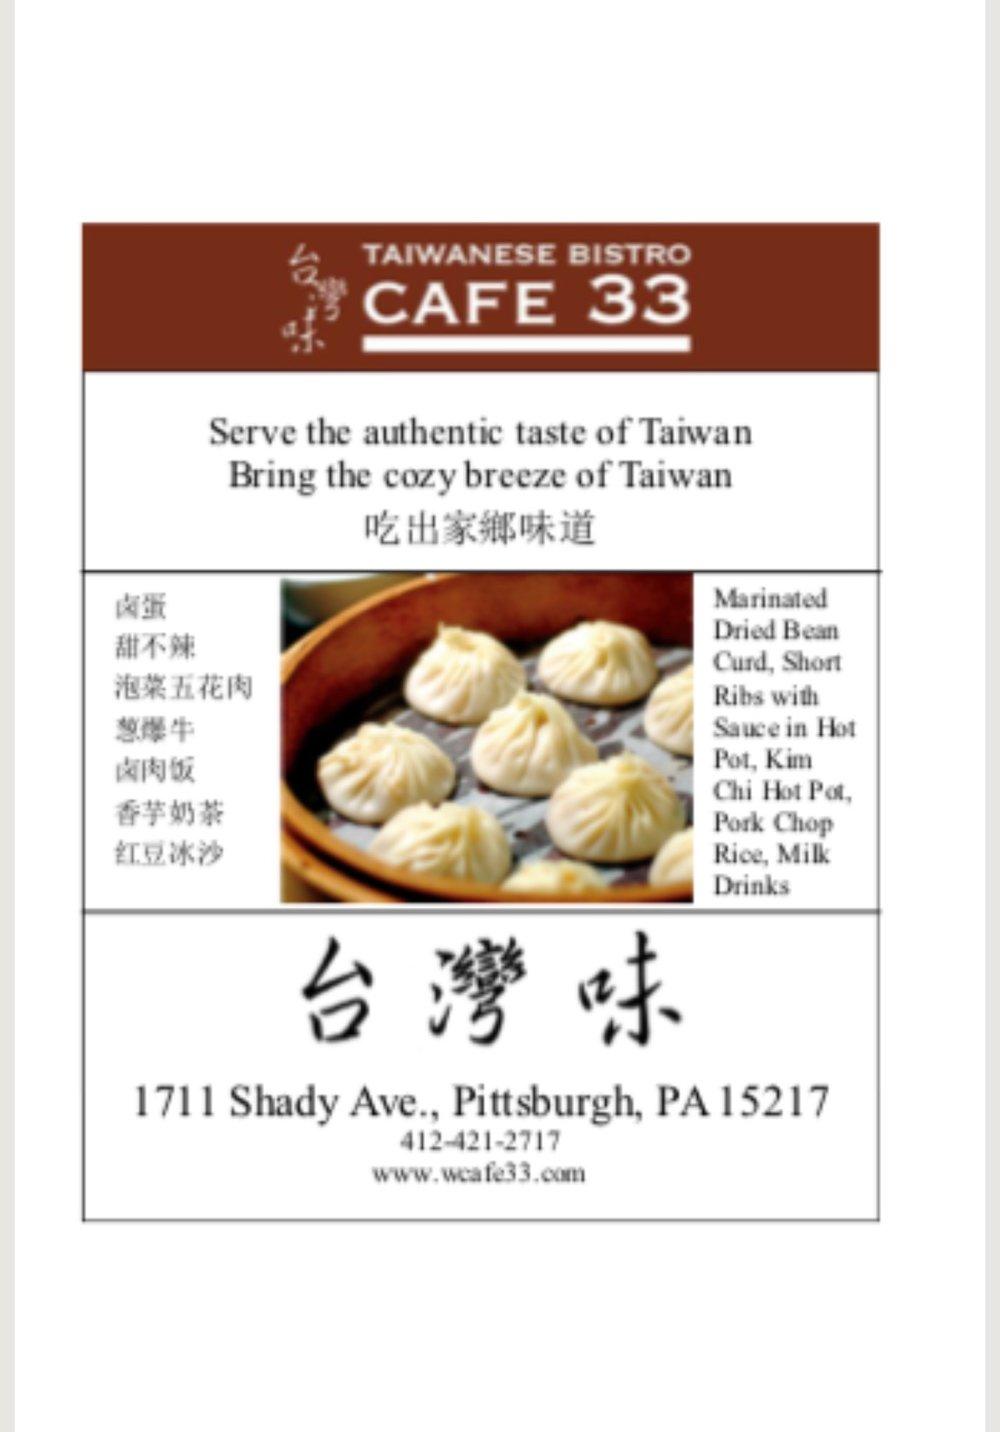 Cafe 33.jpg